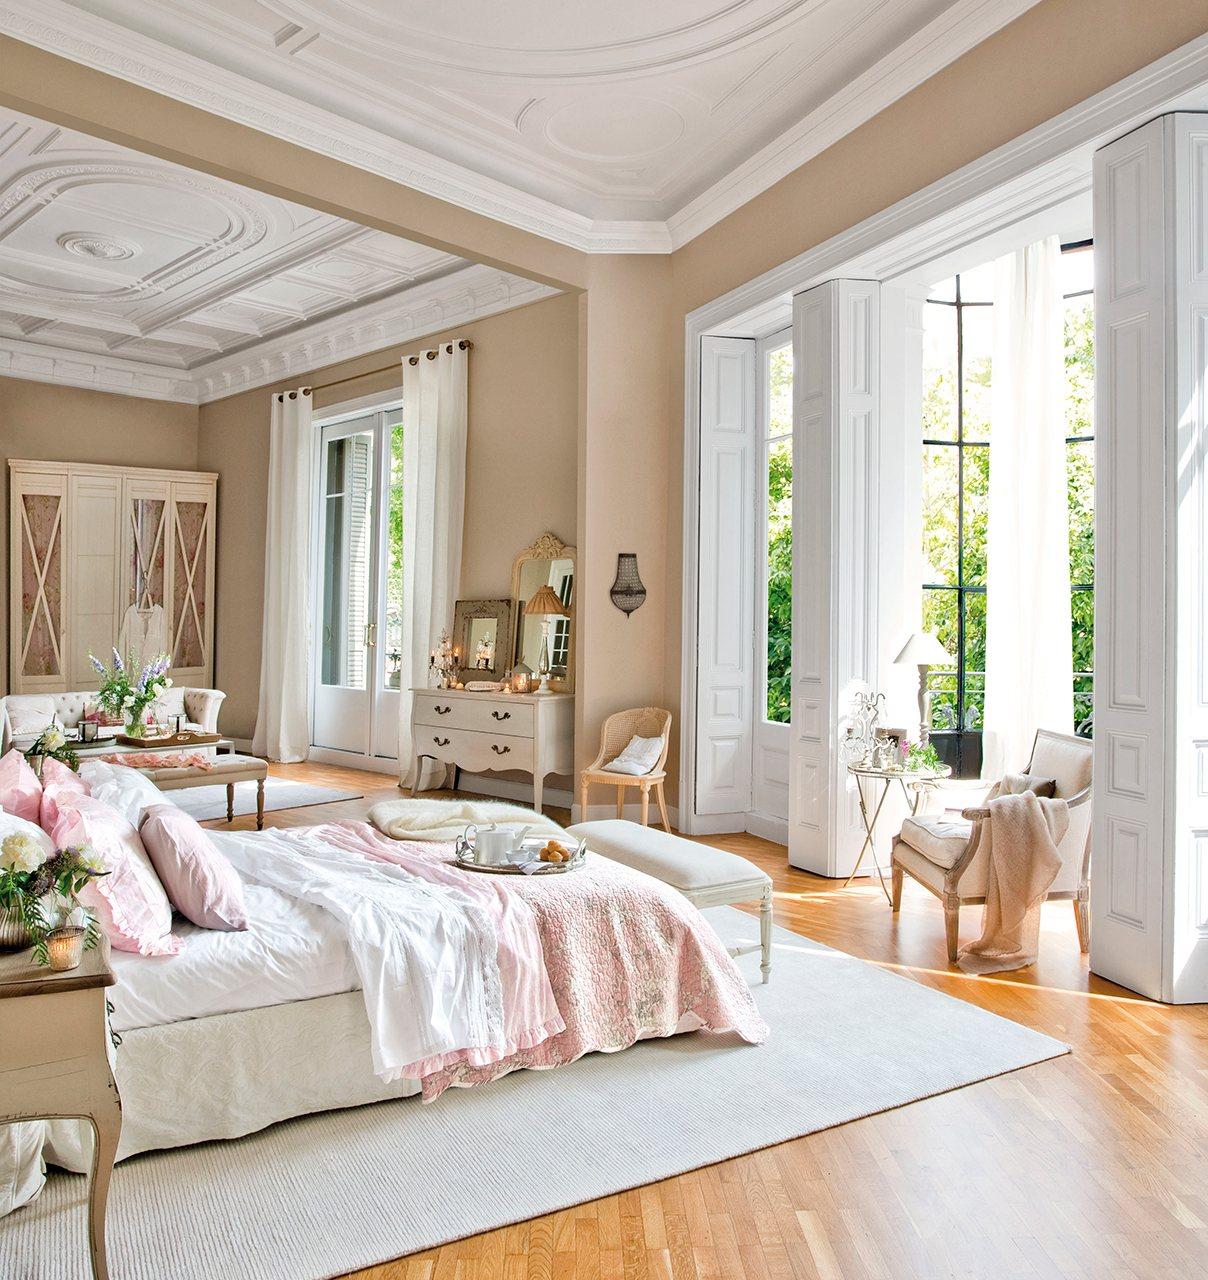 21 Charming & Comfortable Bedroom Interior Design on Comfortable Bedroom Ideas  id=53306